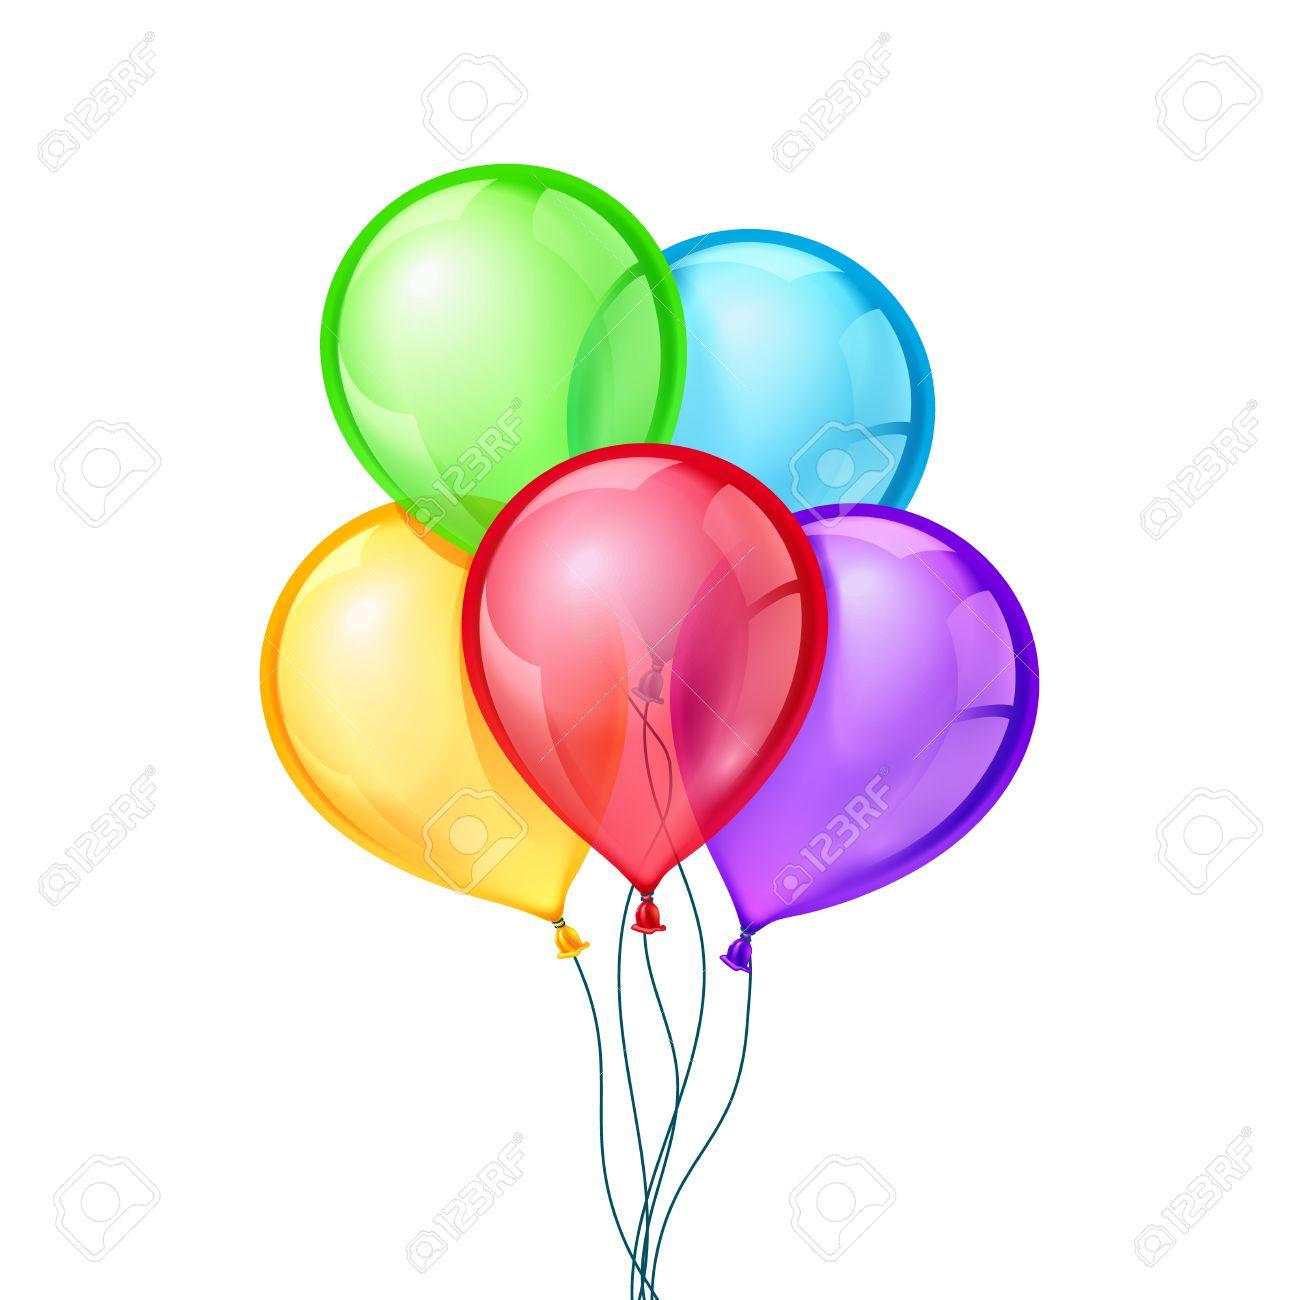 celebratory vetor balloons on isolated transparent background